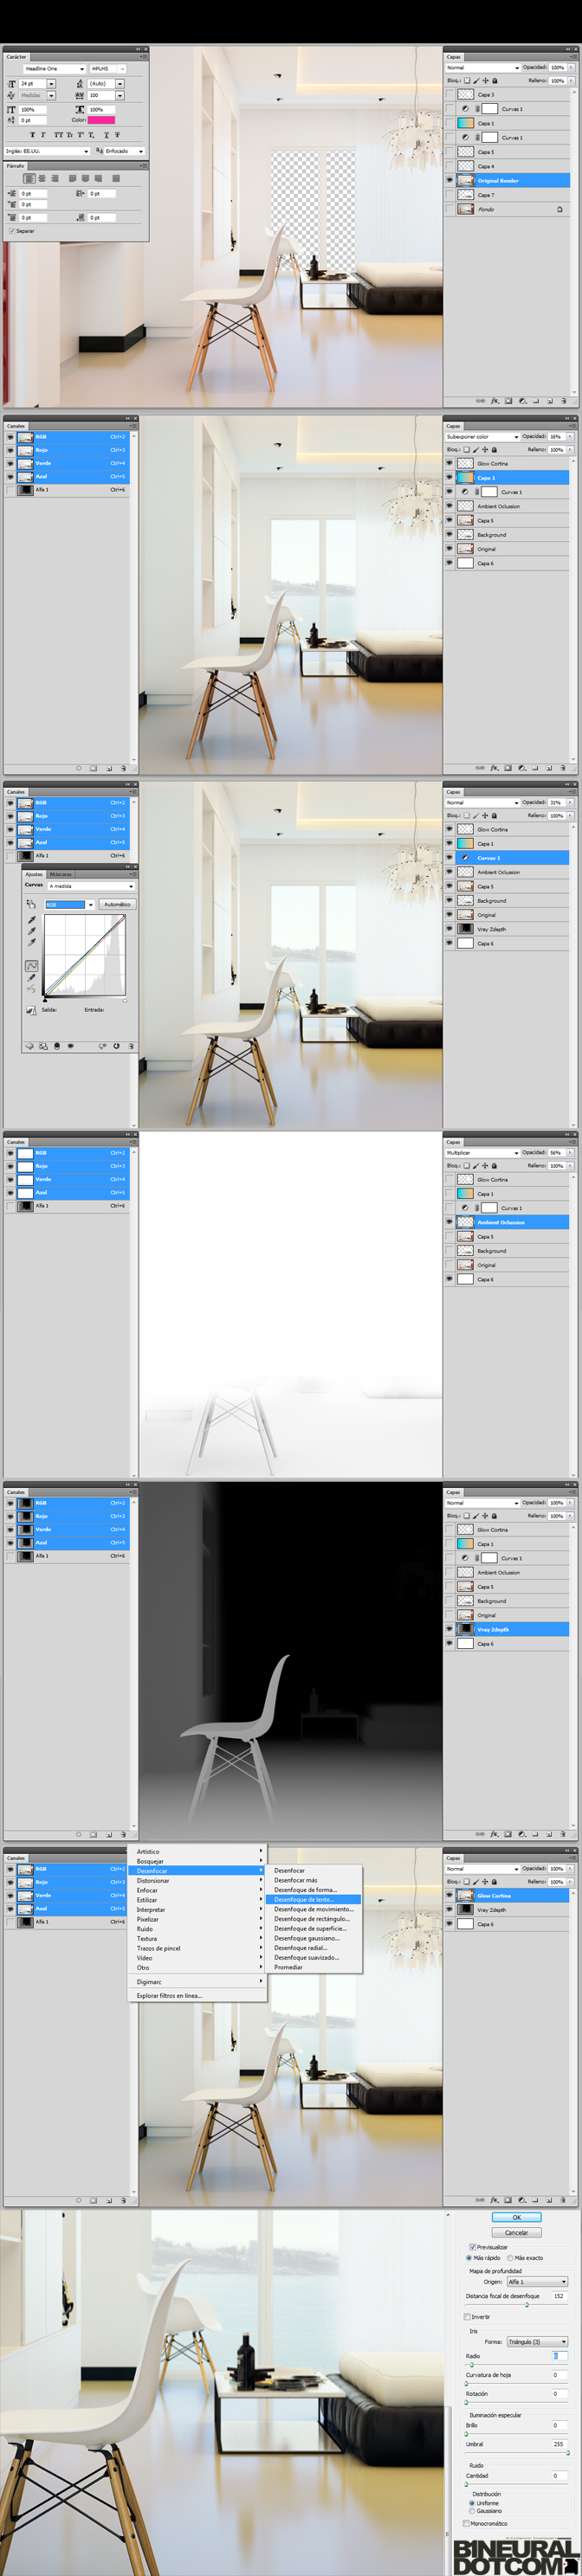 interiores 003-psotwork.jpg